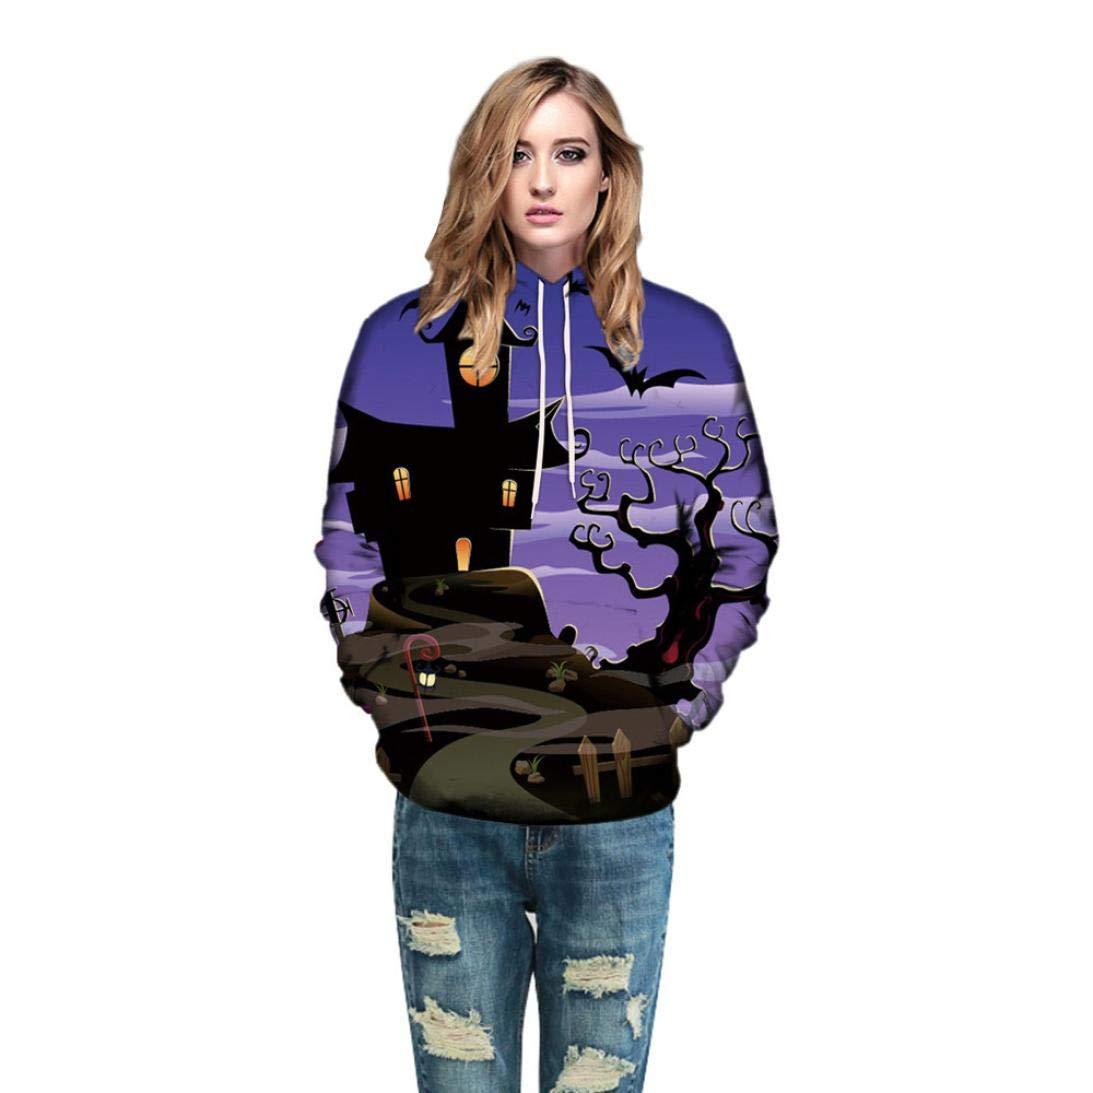 FANOUD Men Women Mode Tops 3D Print Long Sleeve Halloween Hoodies Top Blouse T Shirts